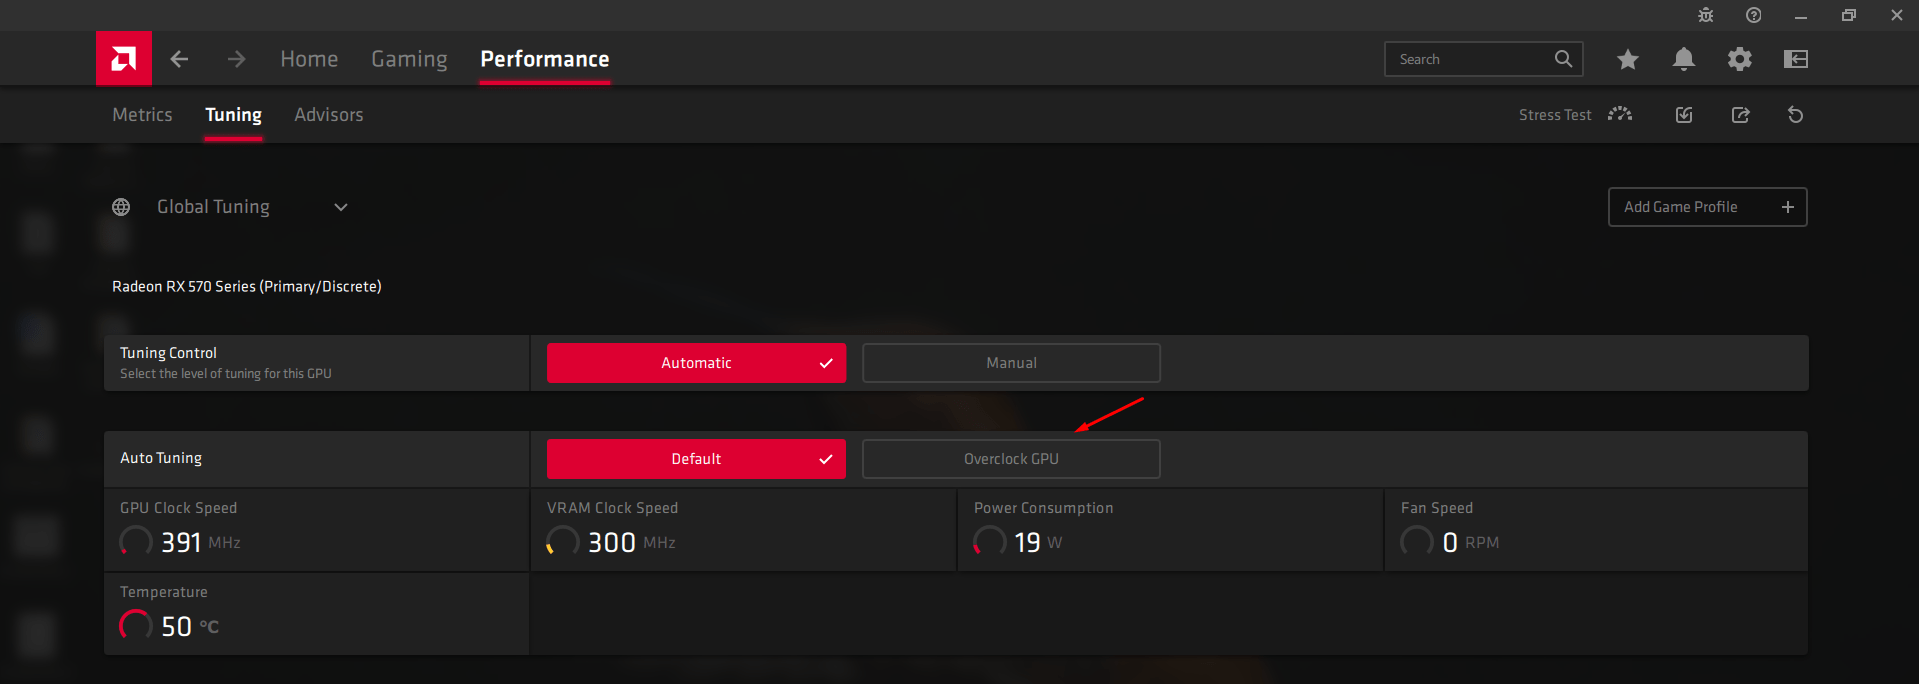 "Click on the ""Overclock GPU"" option"